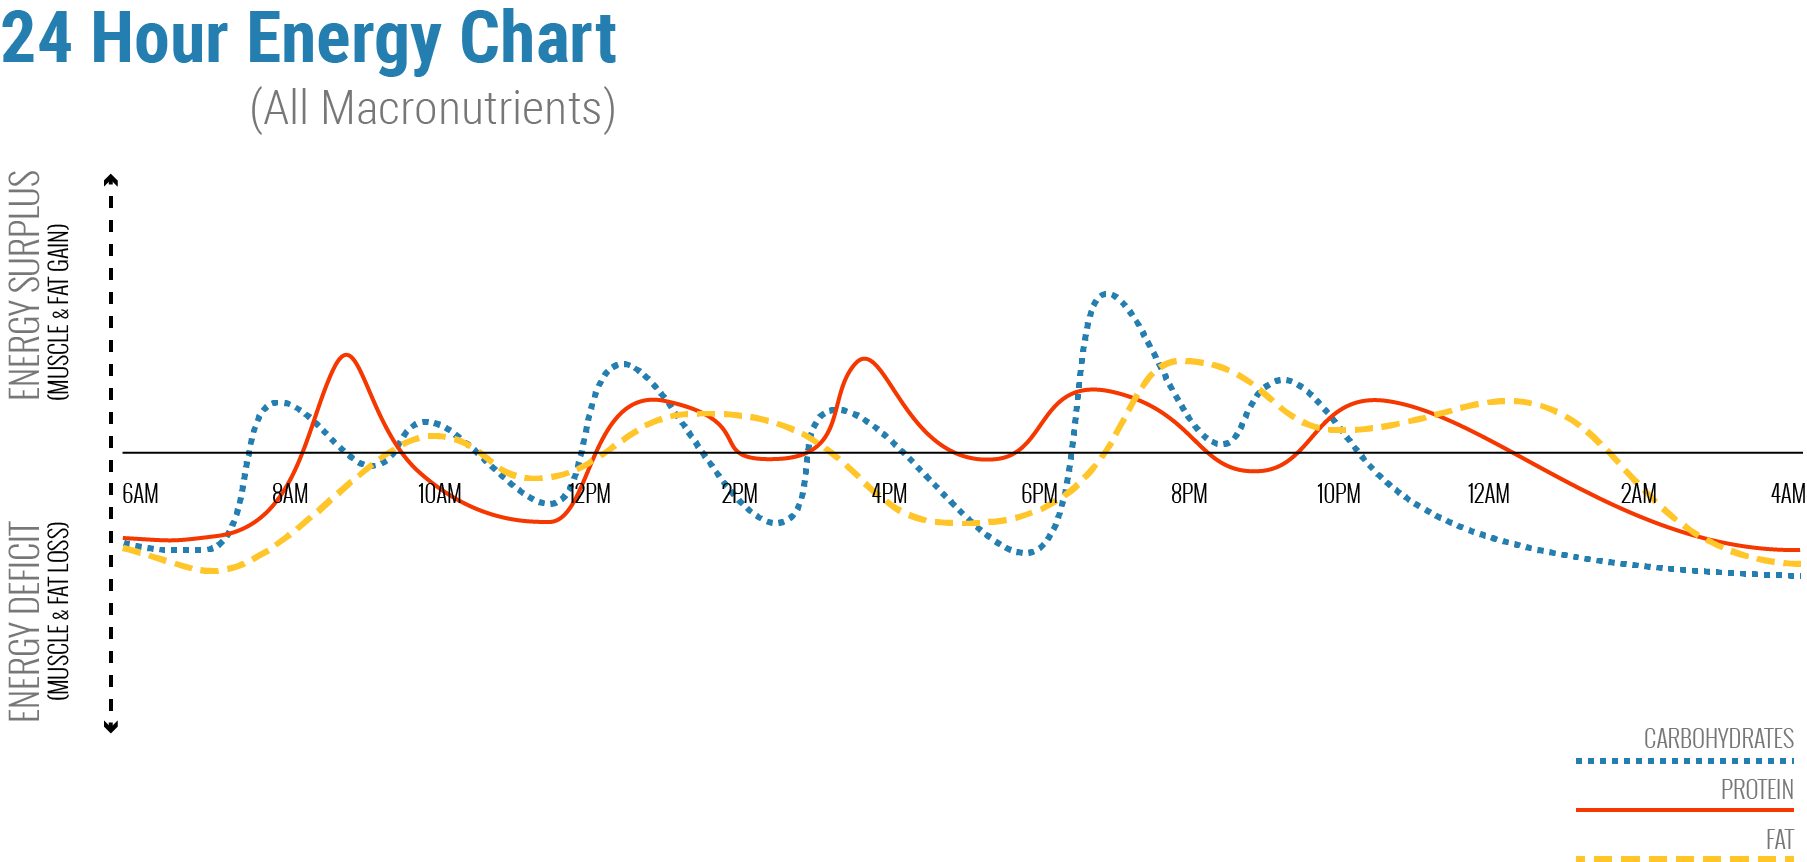 24 Hour Macronutrient Intake Chart